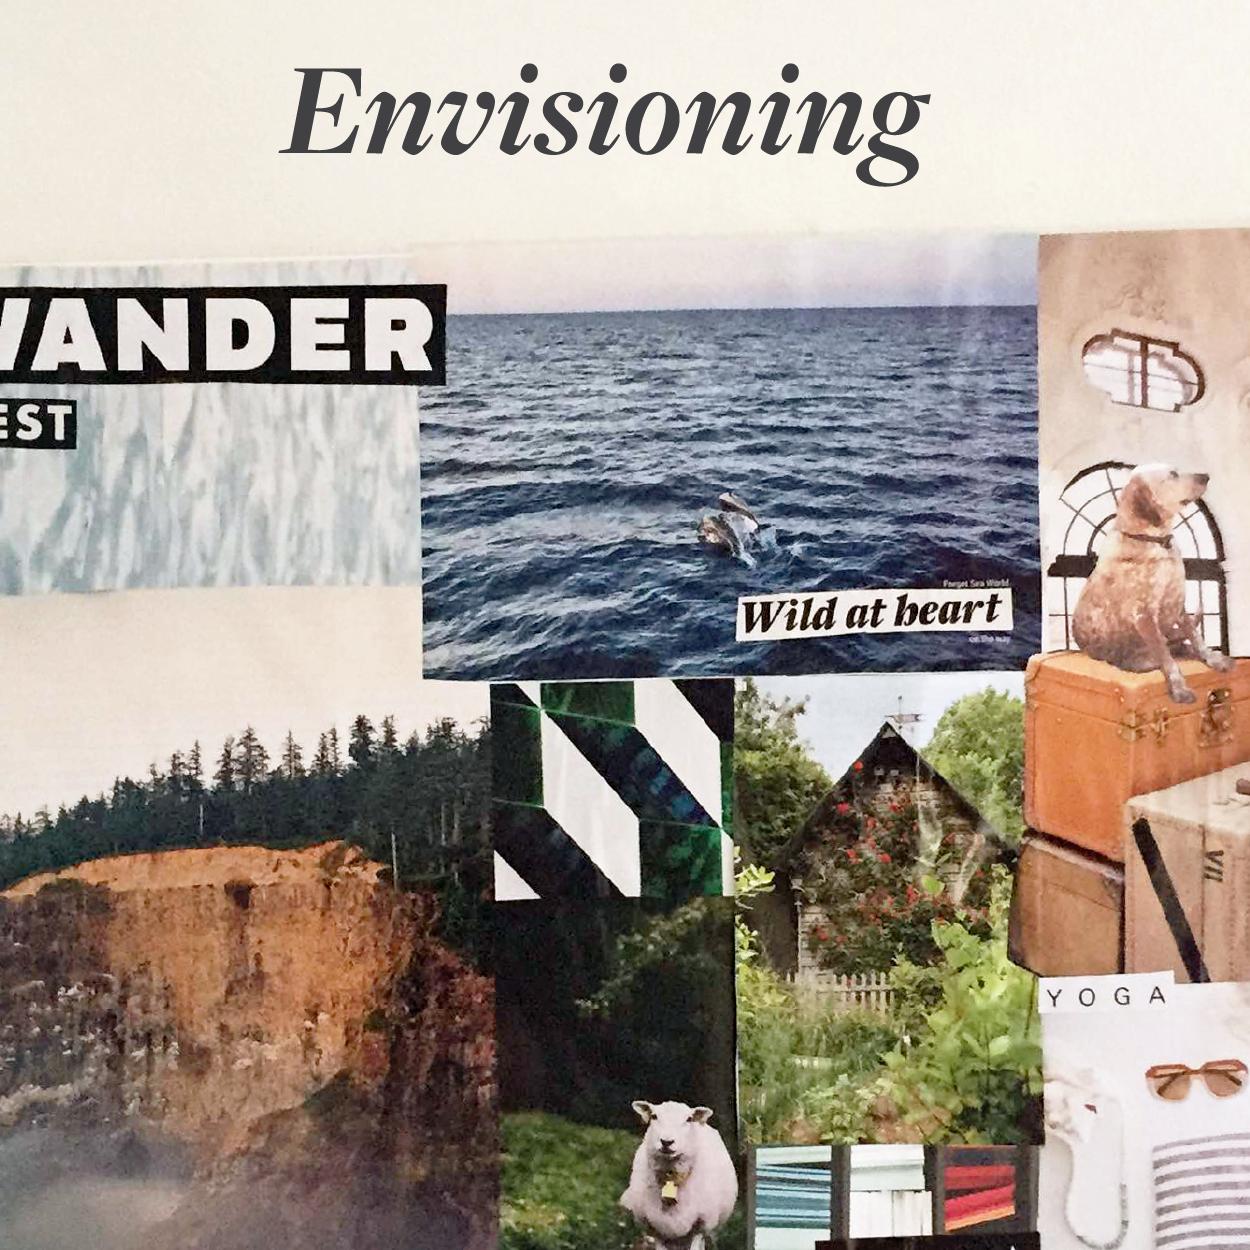 Envisioning